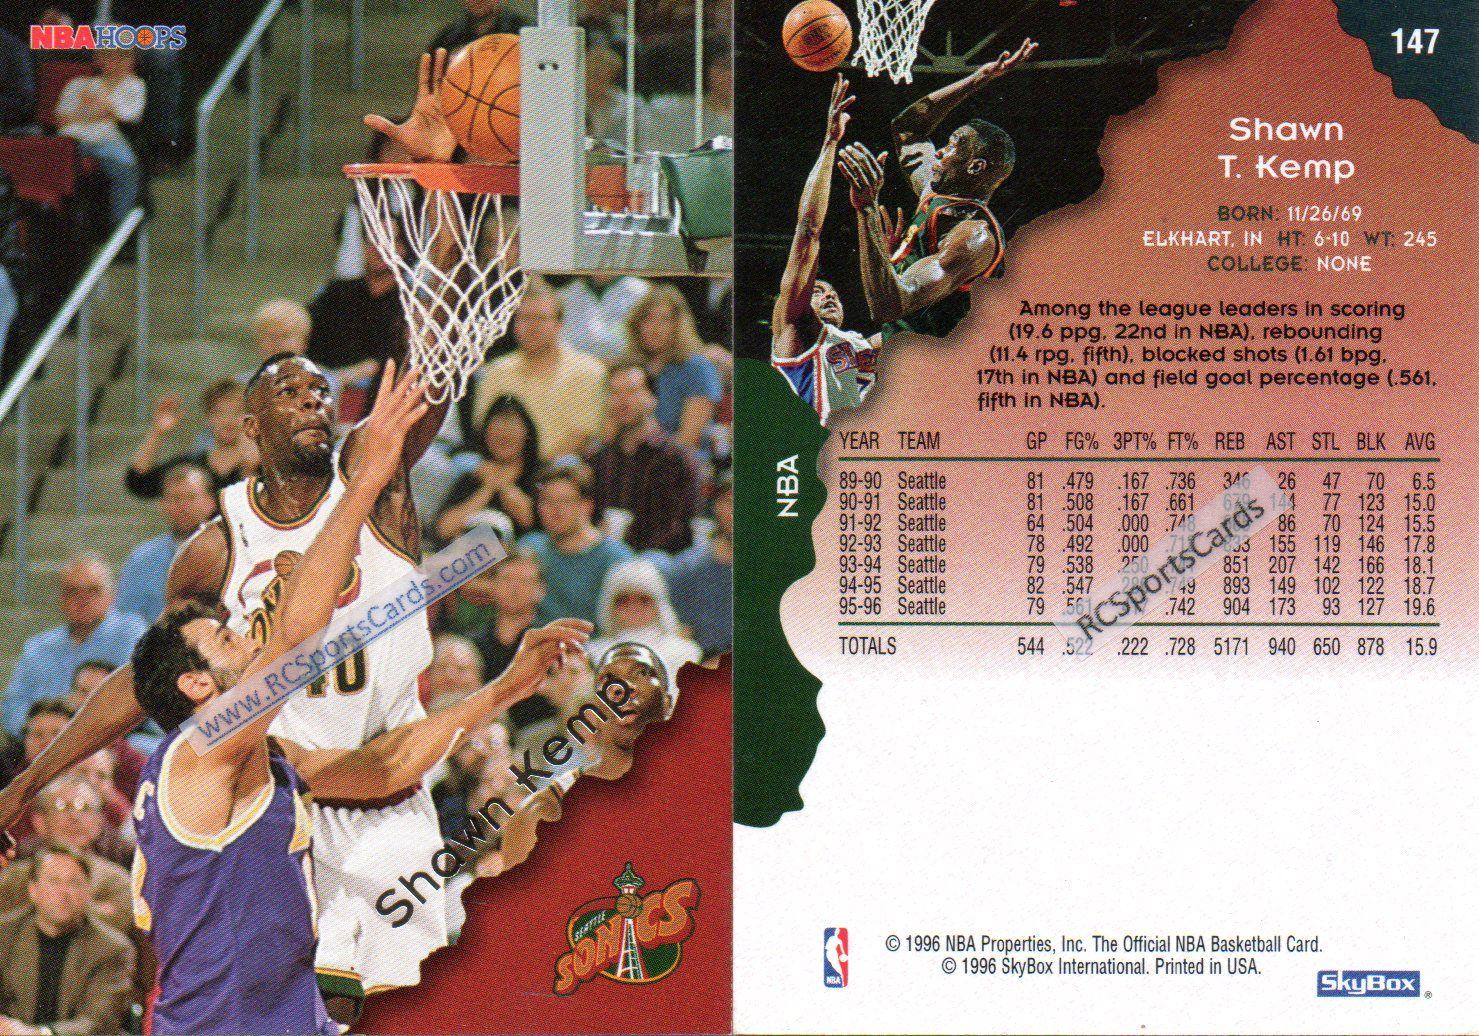 199697 shawn kemp 2 hoops cards 147 itmn3414 sonics